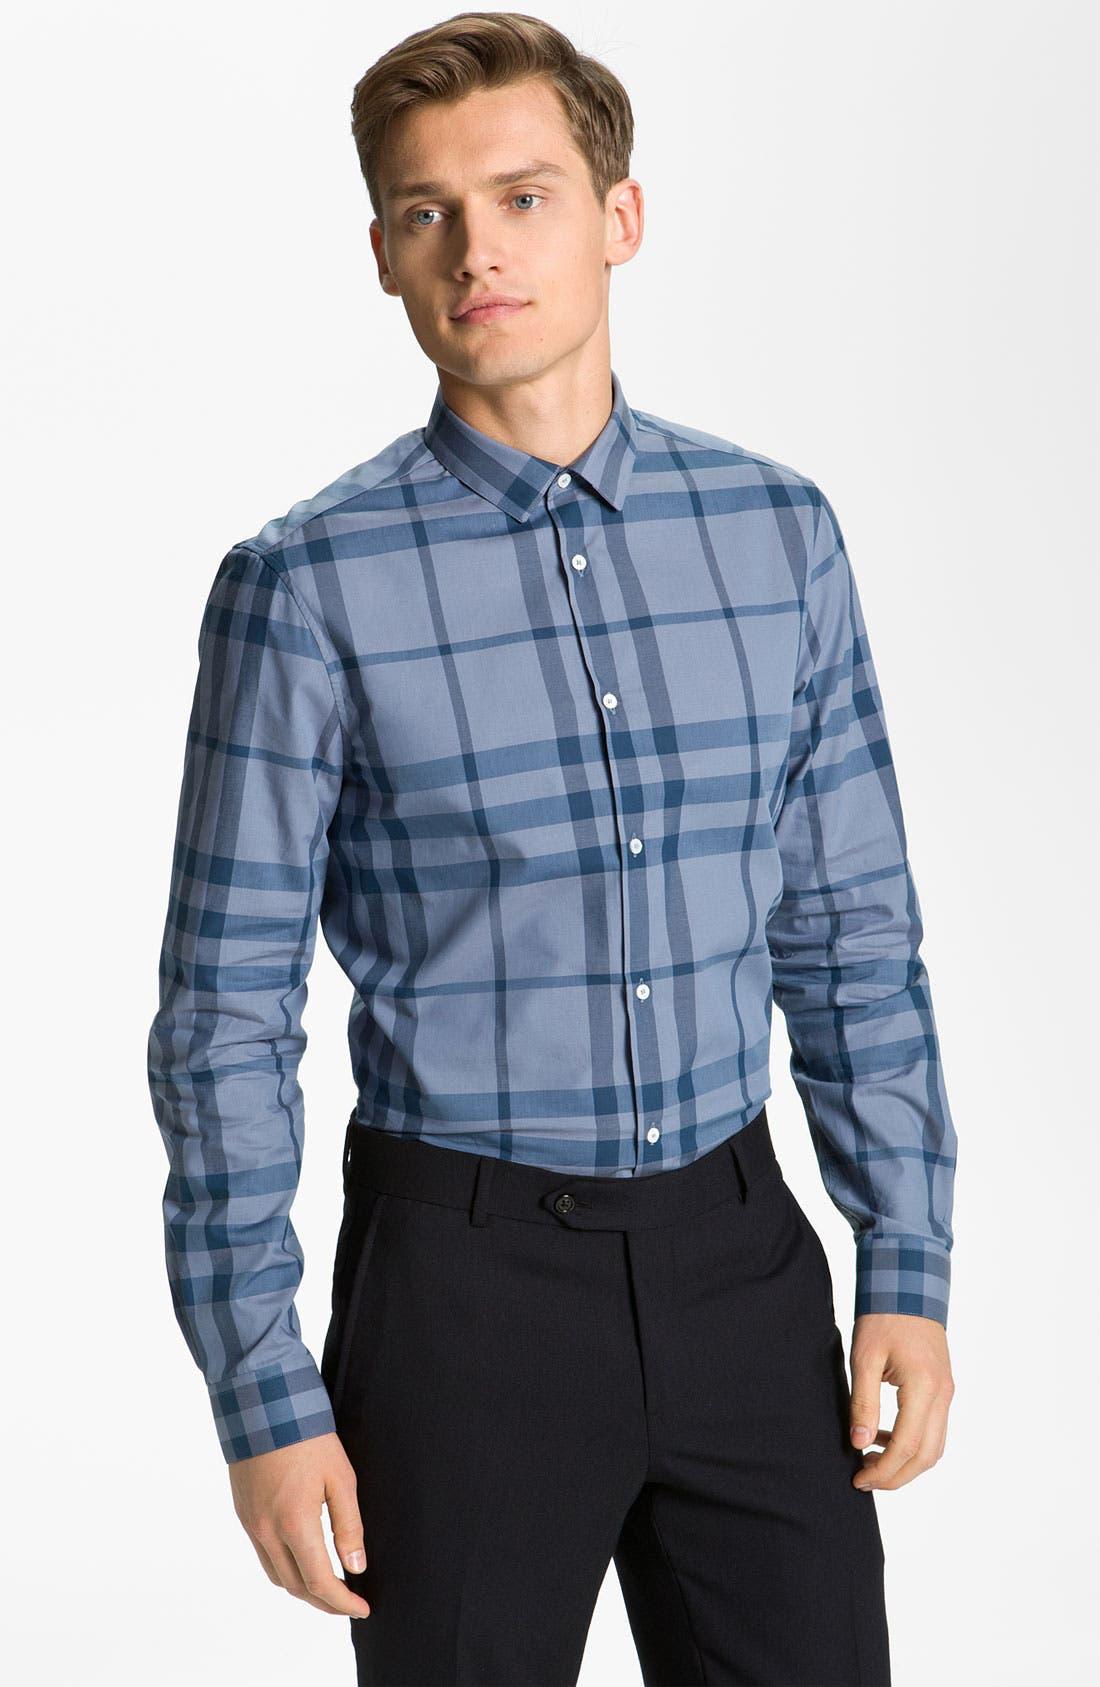 Alternate Image 1 Selected - Burberry London Woven Cotton Shirt